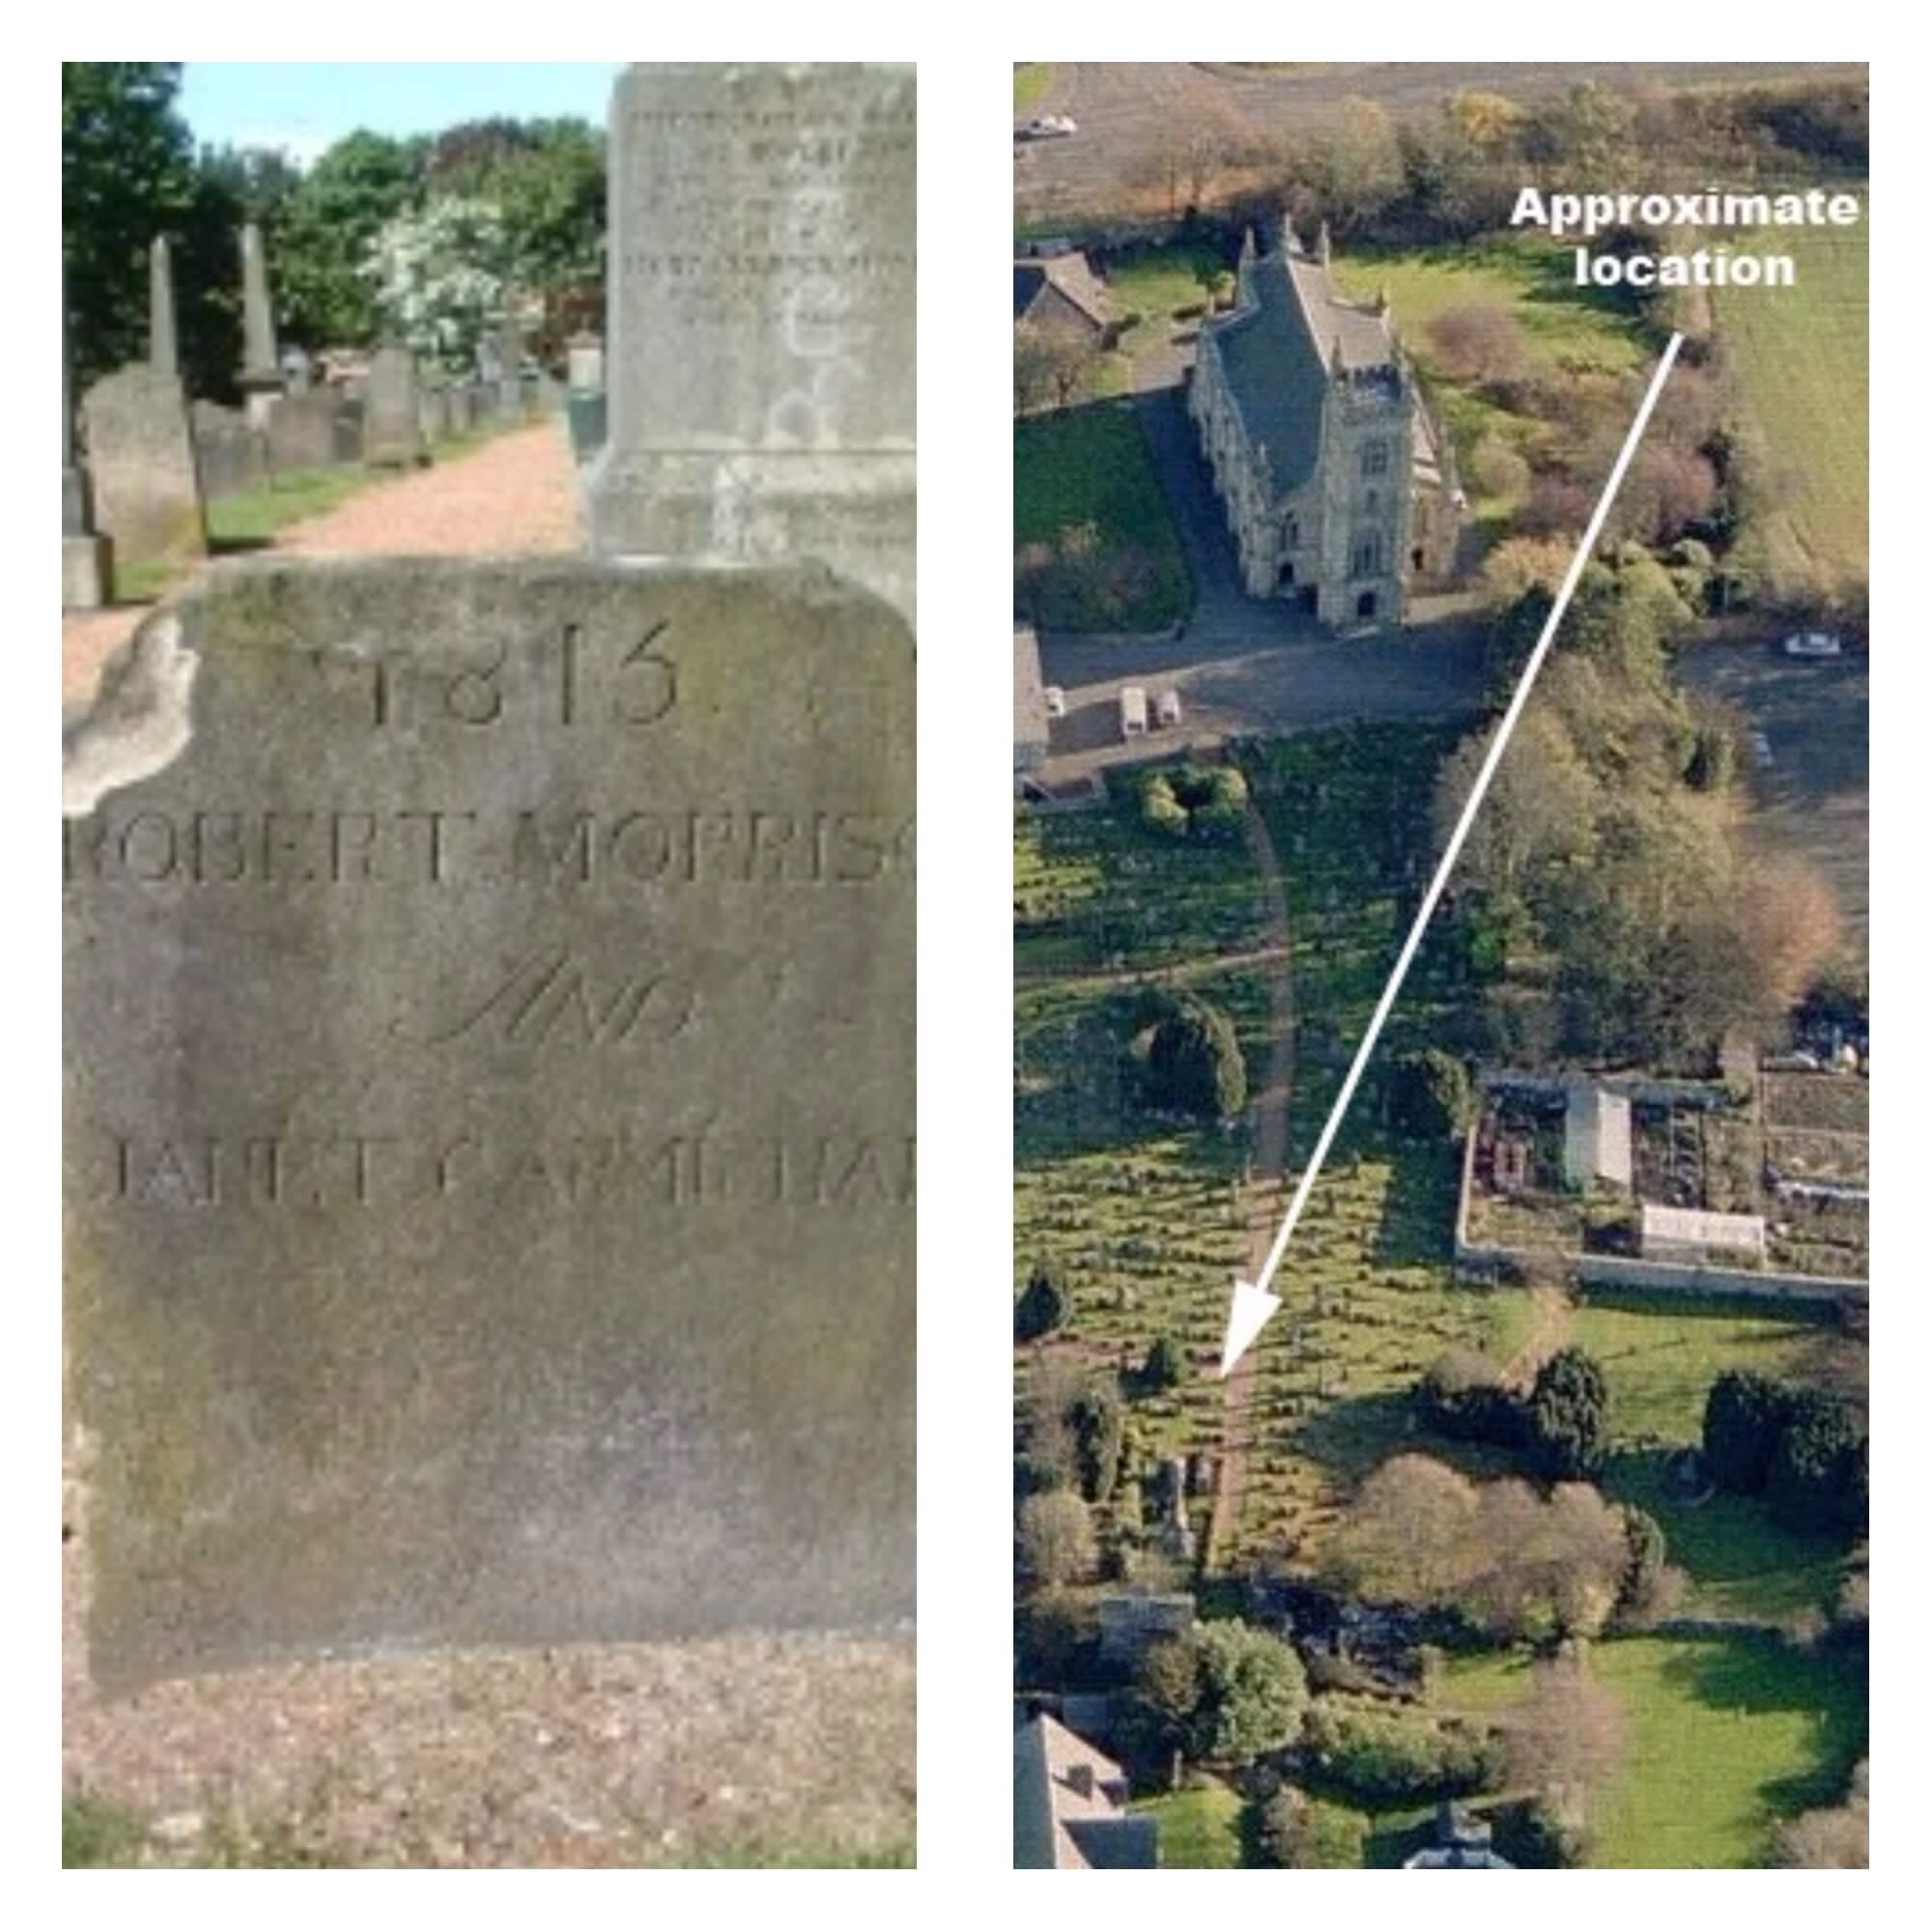 Robert Morison and Janet Carmichael grave stone